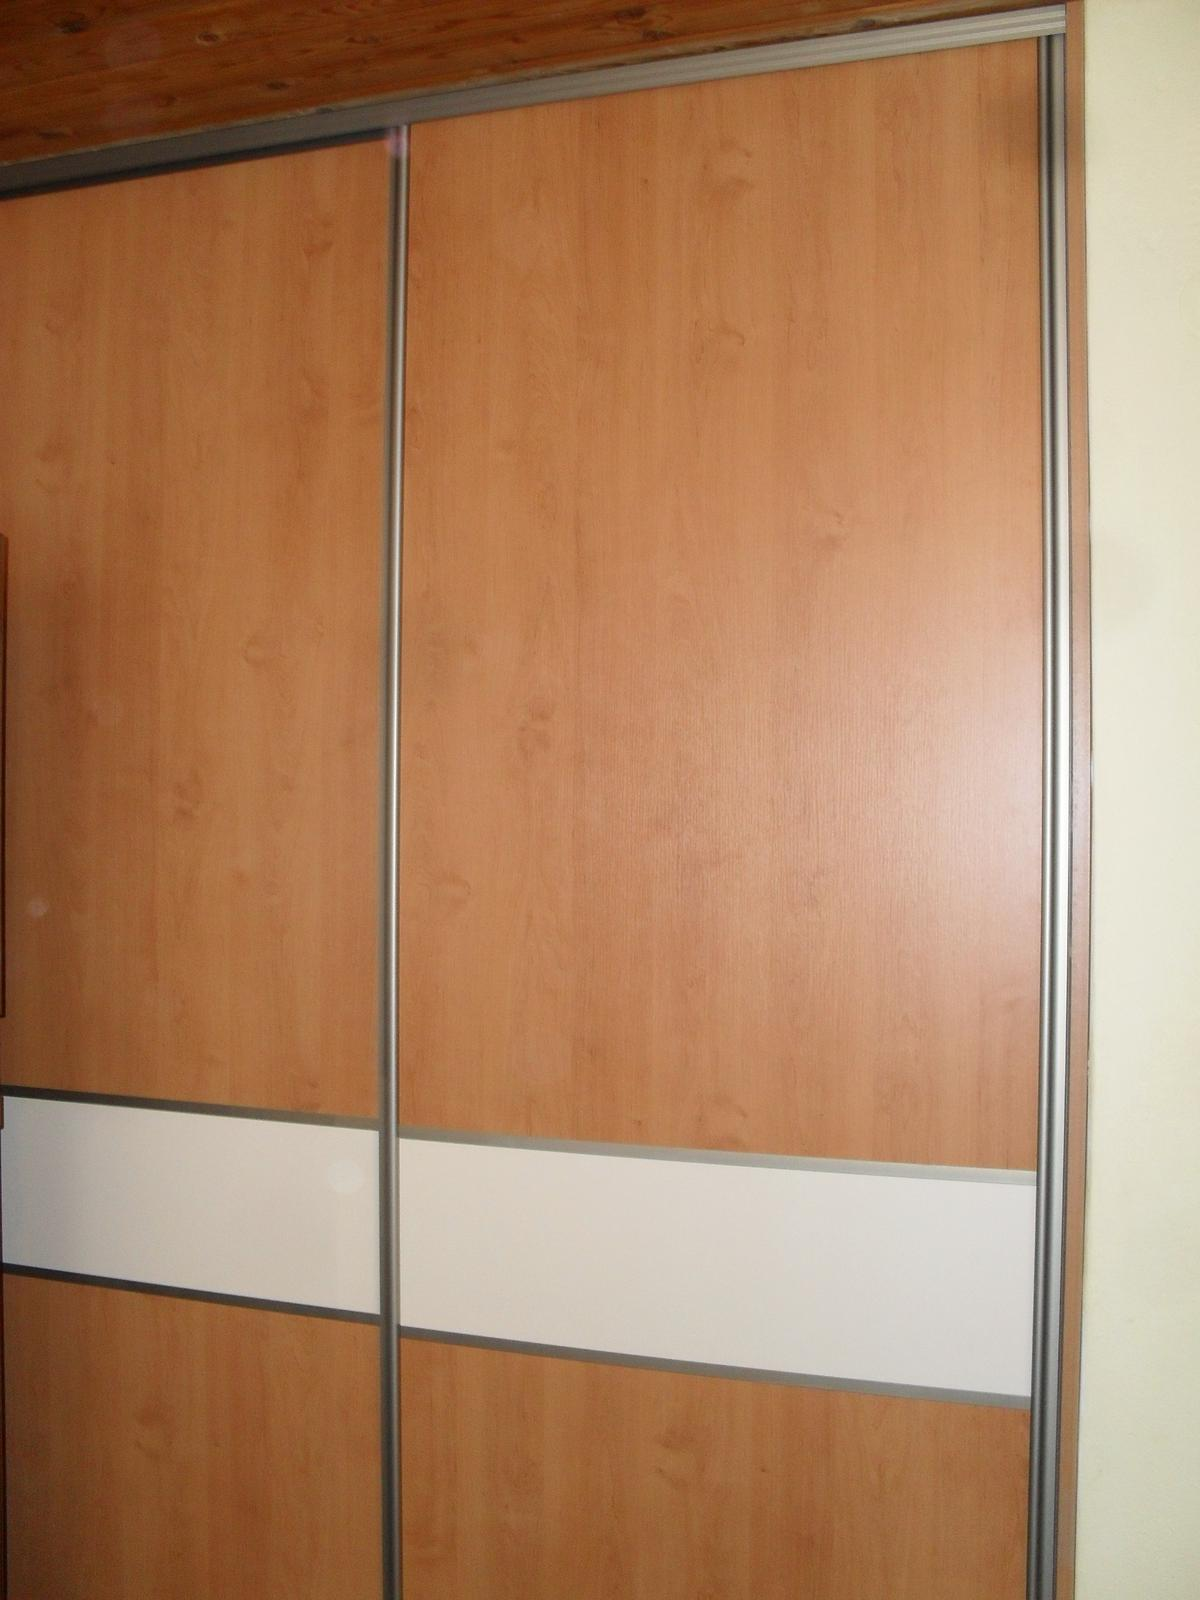 Vstavané skrine Martin Benko Bošany - Obrázok č. 17